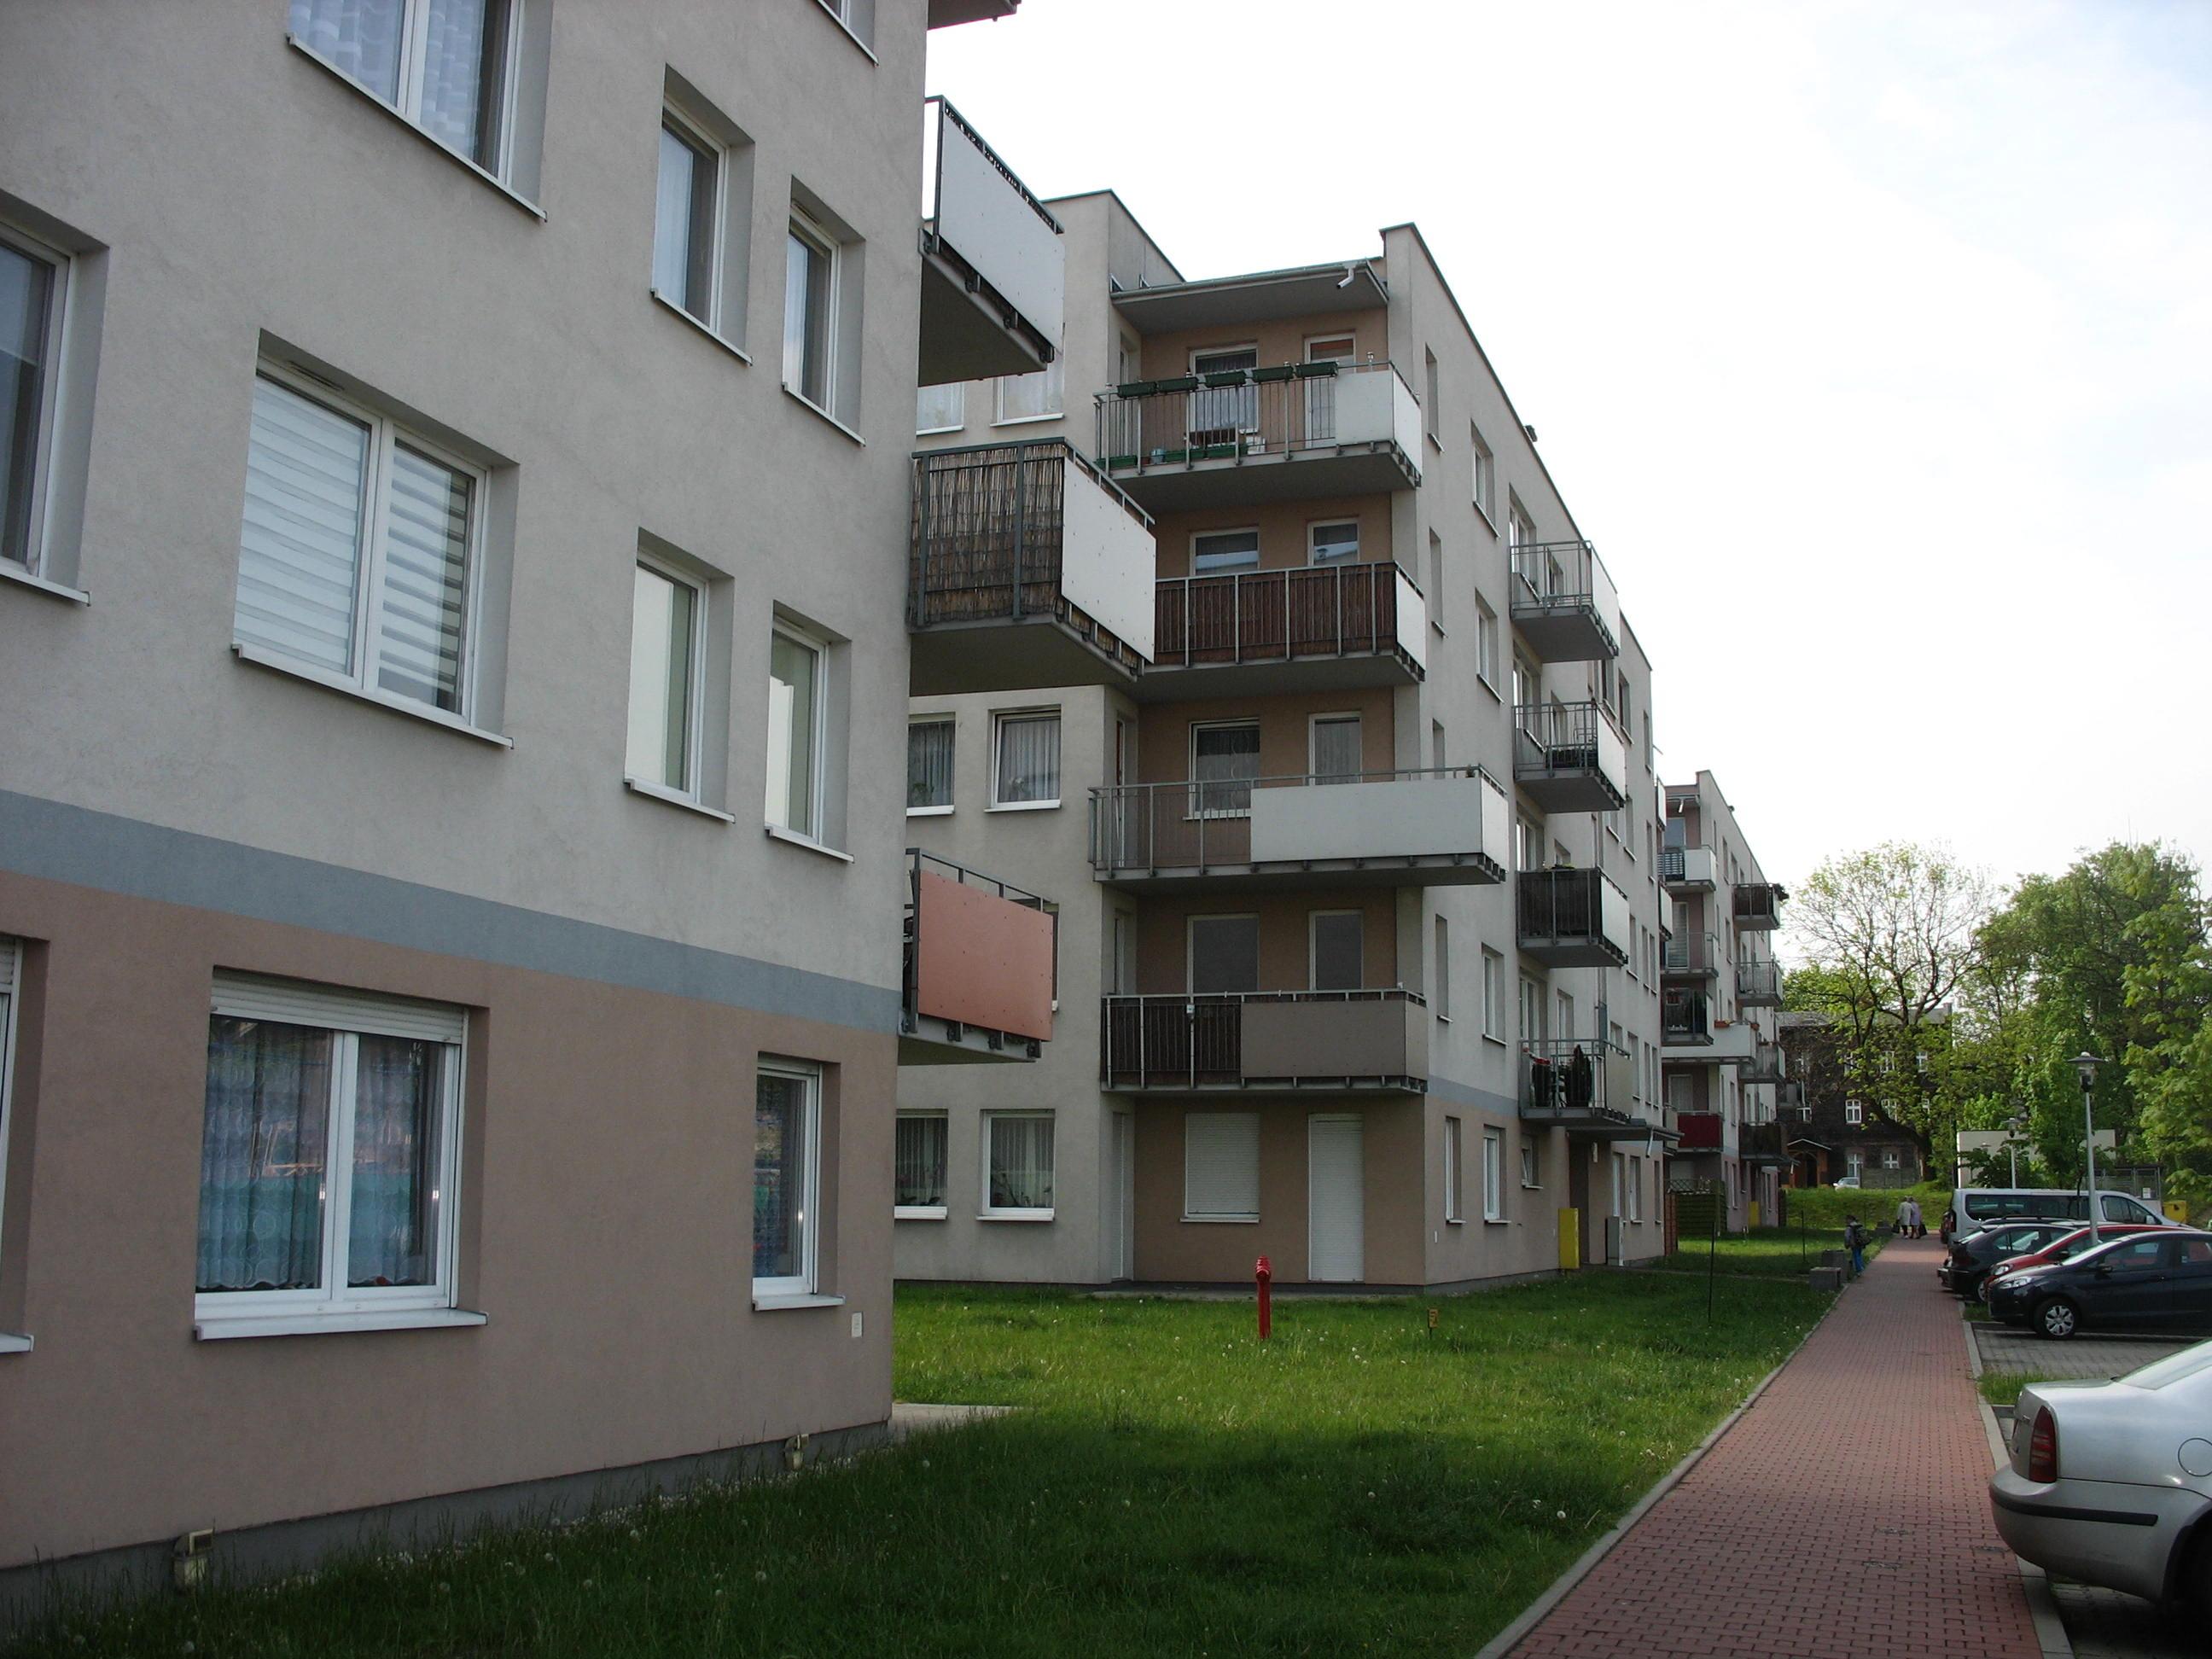 Wspólnota Mieszkaniowa Ruda Śląska